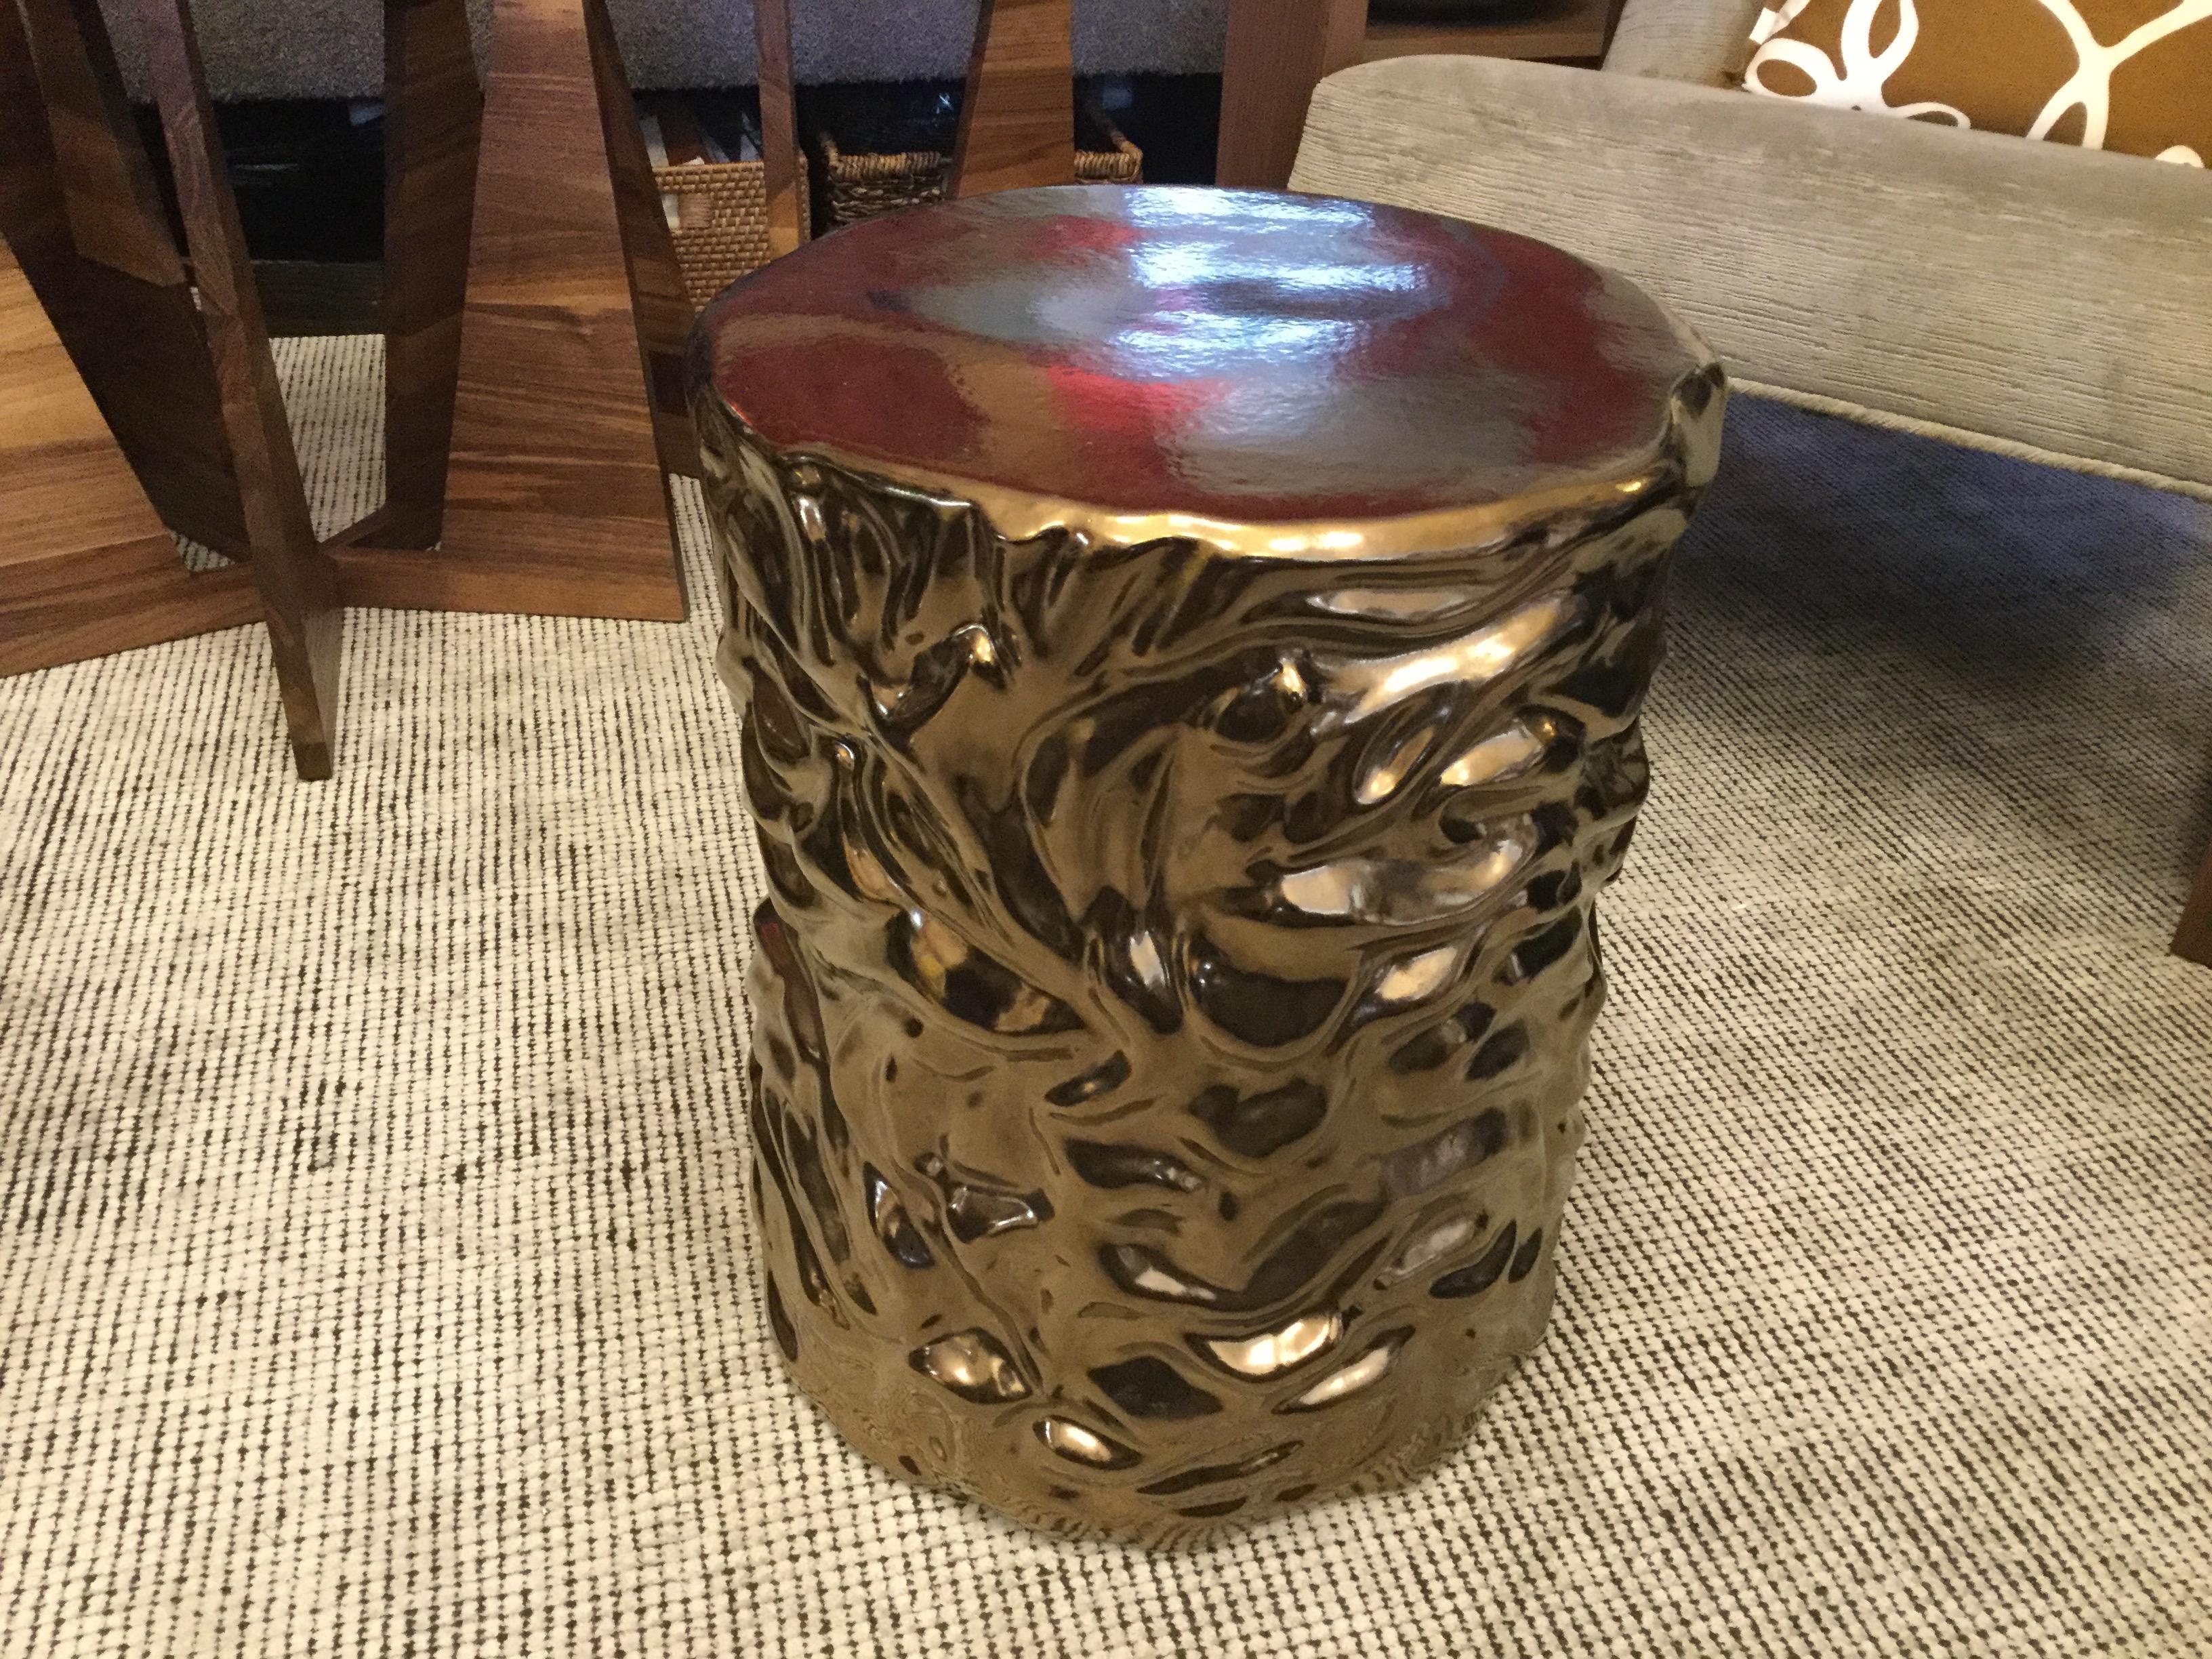 Glossy Gold Ceramic Stool - Image 4 of 5  sc 1 st  Chairish & Glossy Gold Ceramic Stool | Chairish islam-shia.org